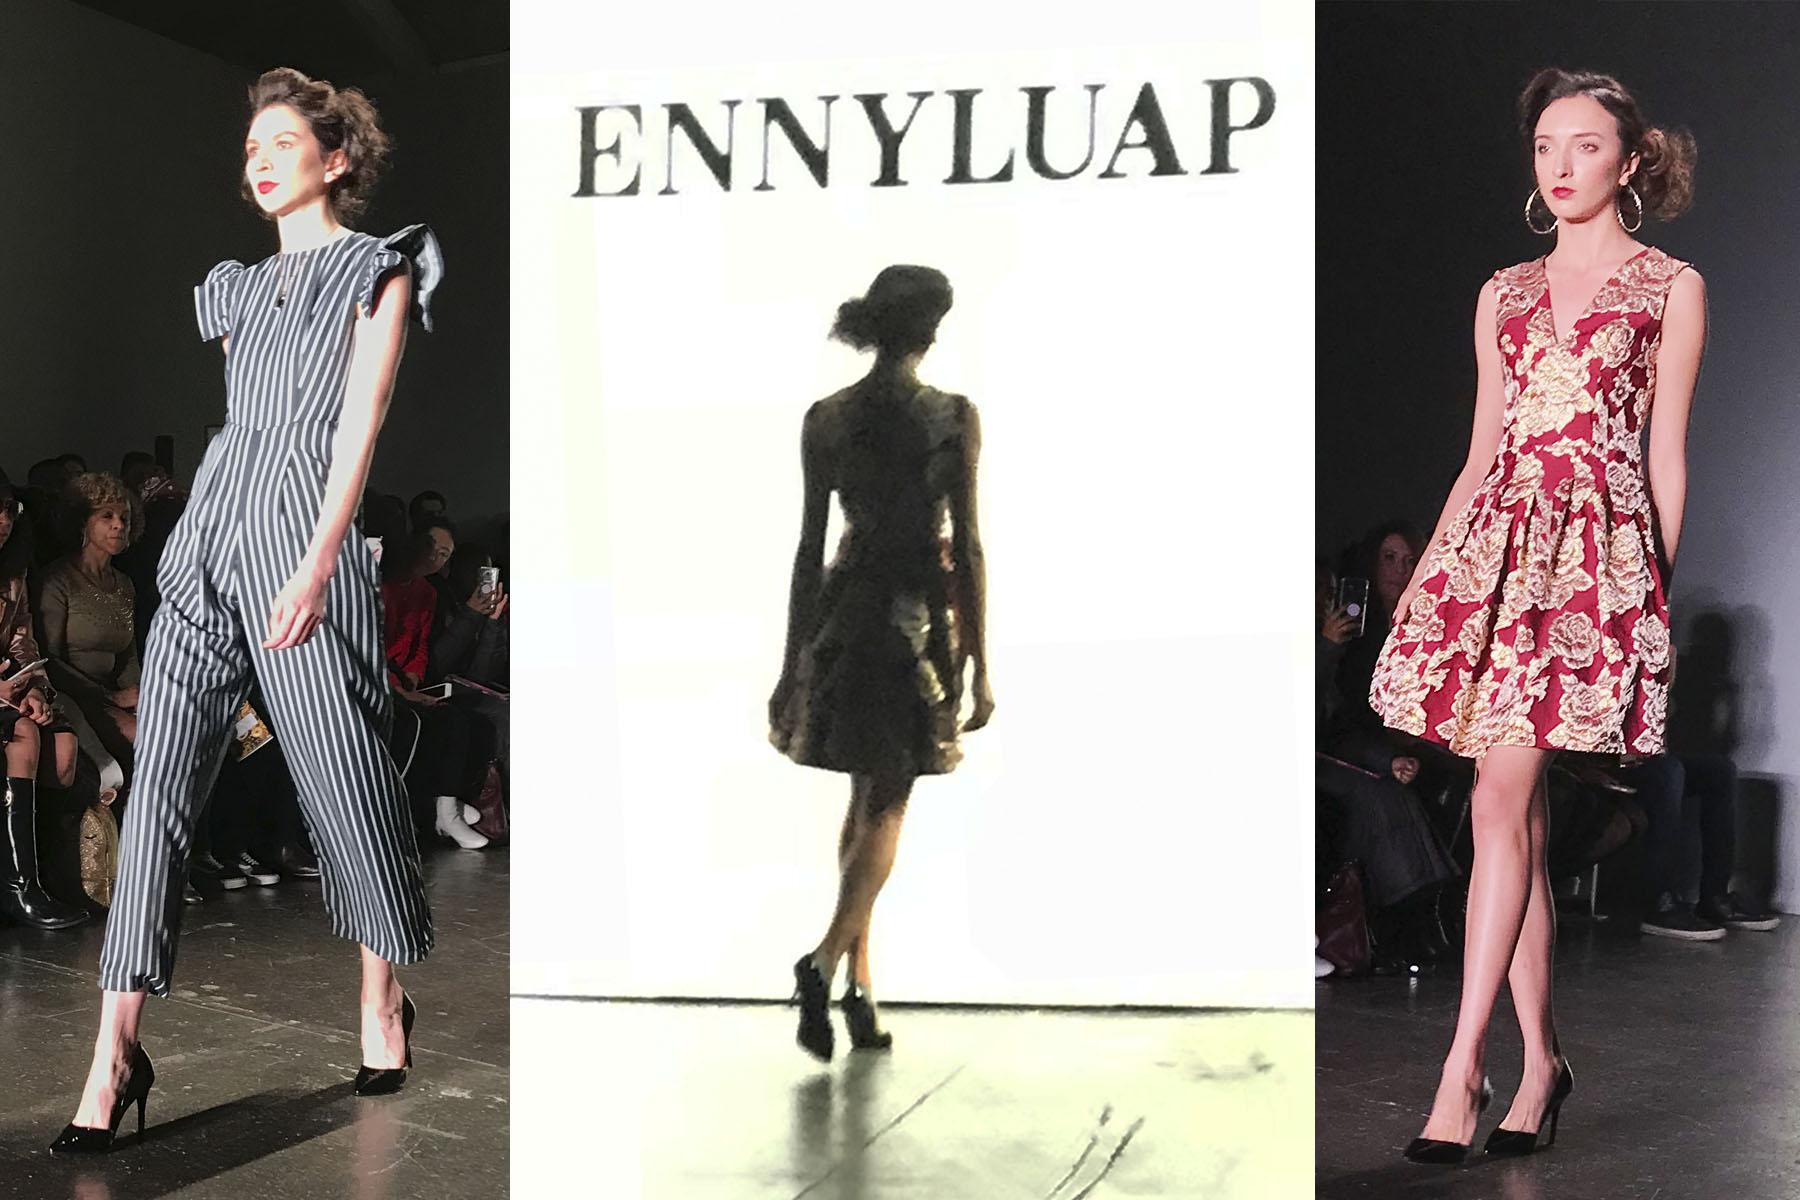 Ennyluap NYFW 2018 Runway show